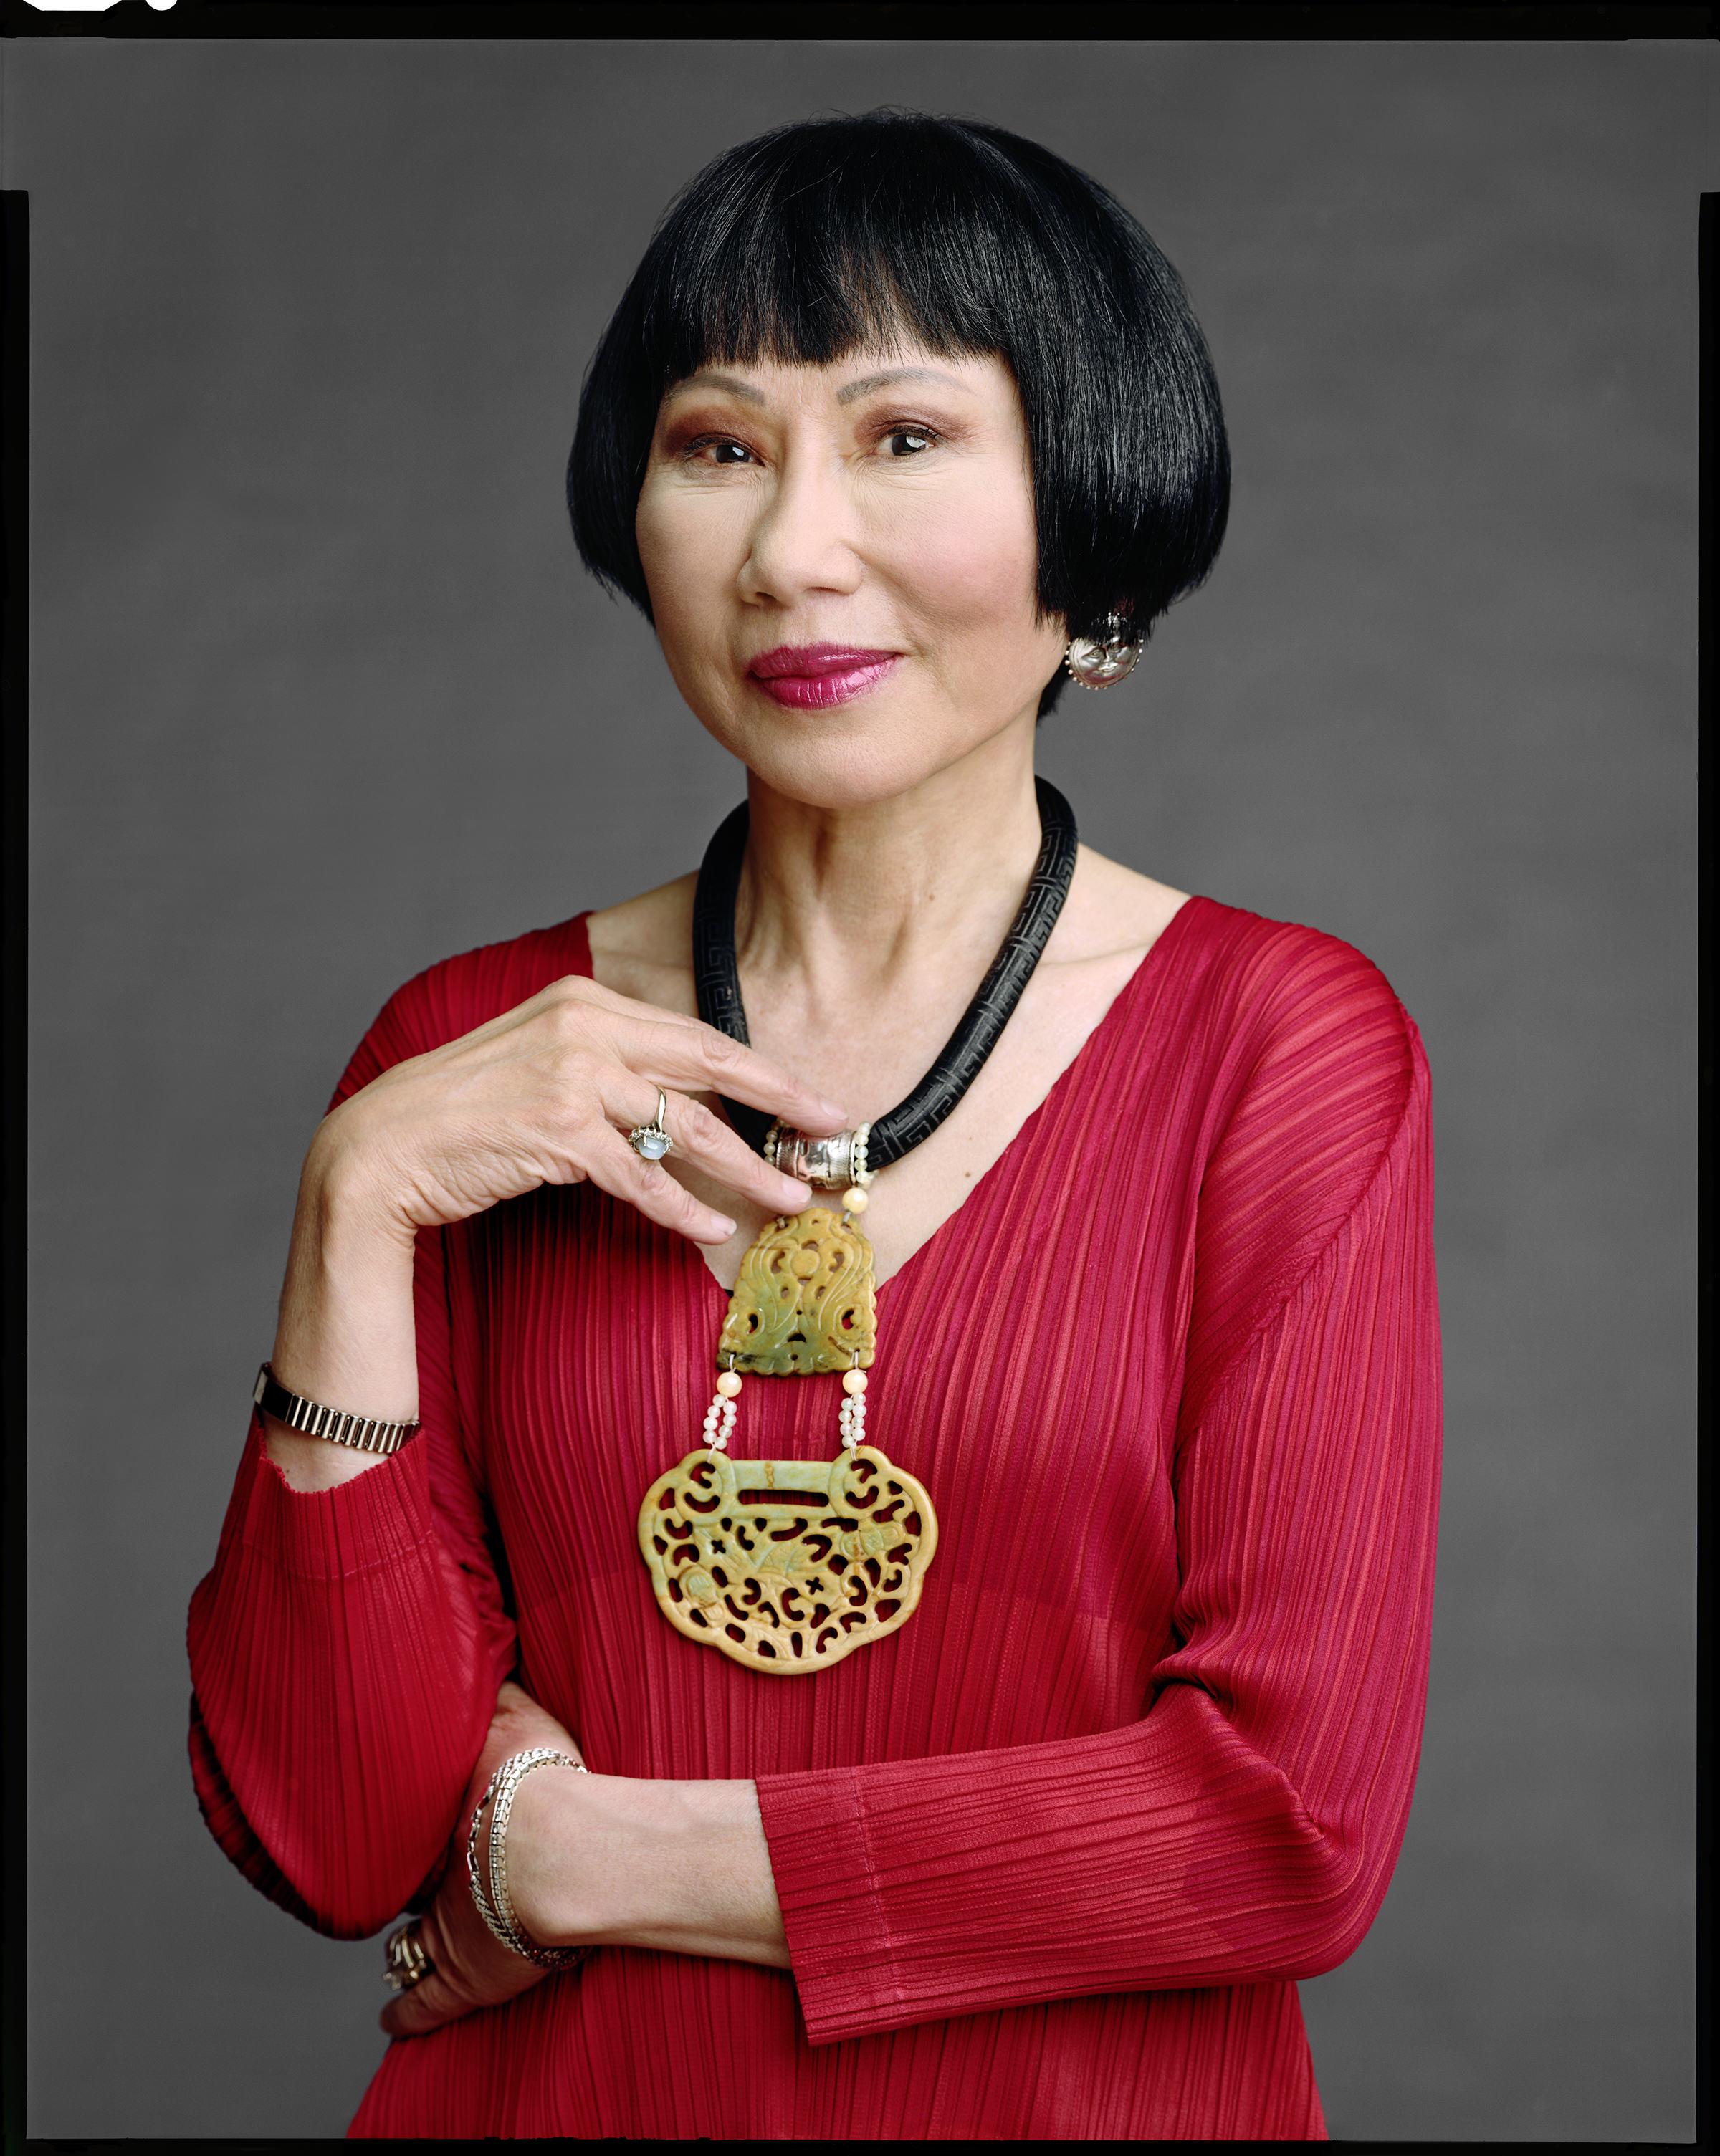 1952: Amy Tan, author